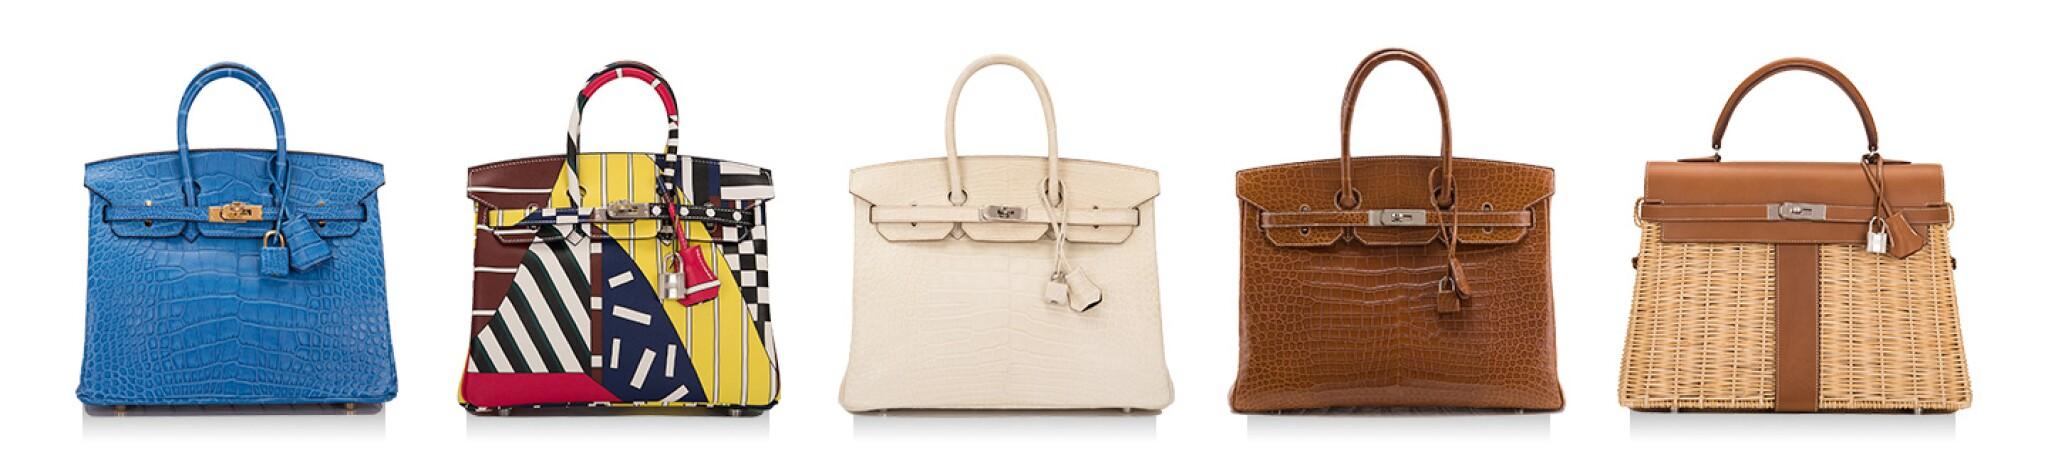 Hermès Handbags Online